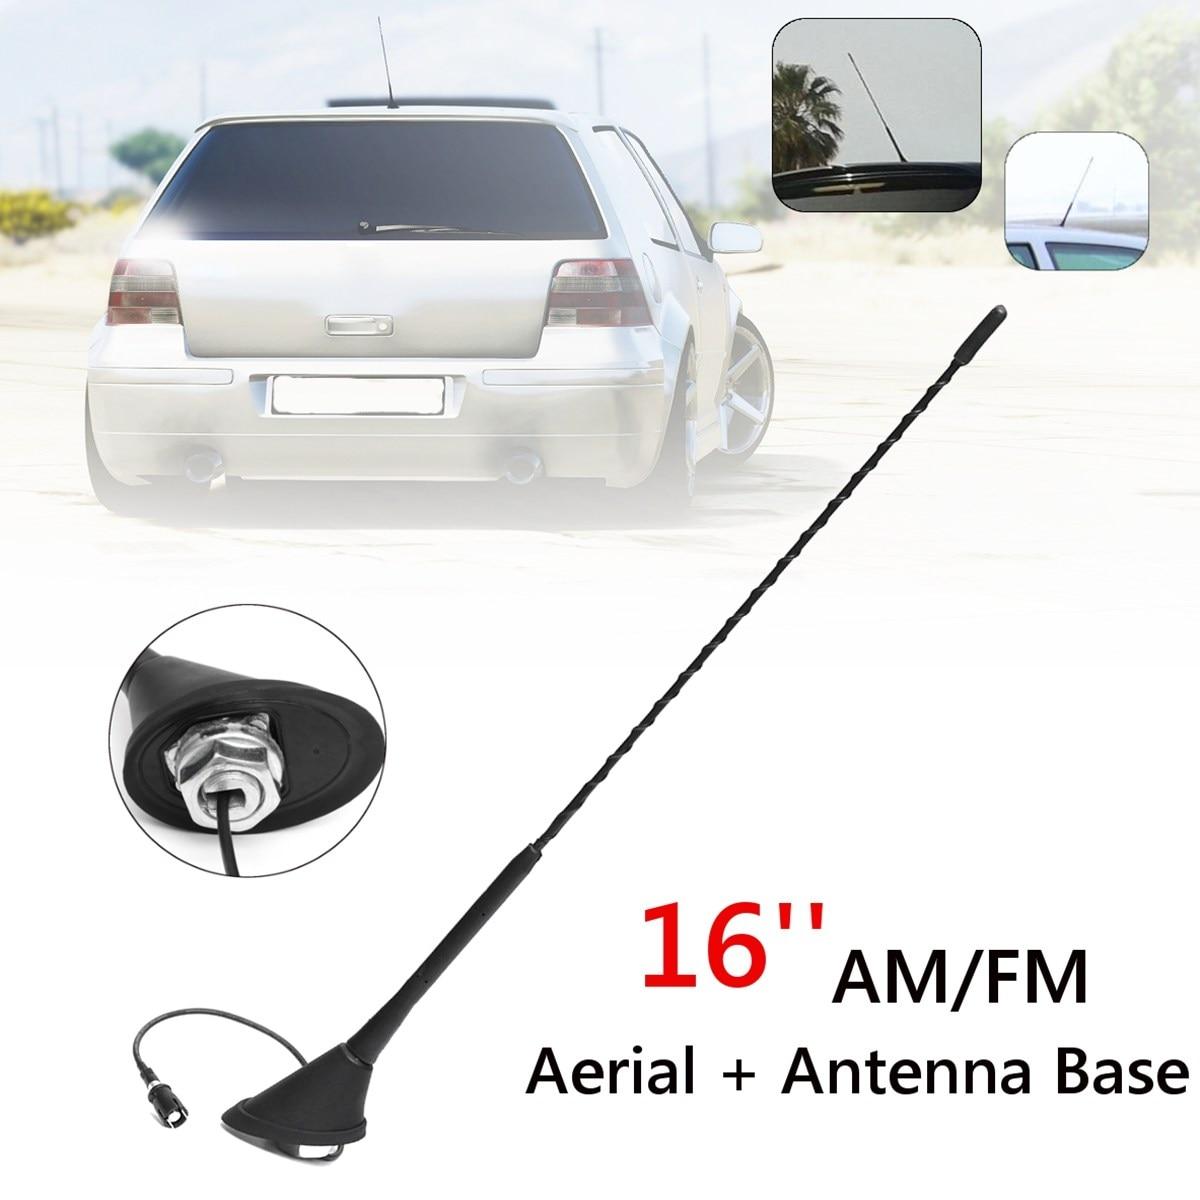 16 pouce Universal AM/FM Antenne Antenne Toit Mât Base Pour VW/Volkswagen/Skoda/Audi/ golf/Passat/Jetta/Bora MK4 1994 1995 1996